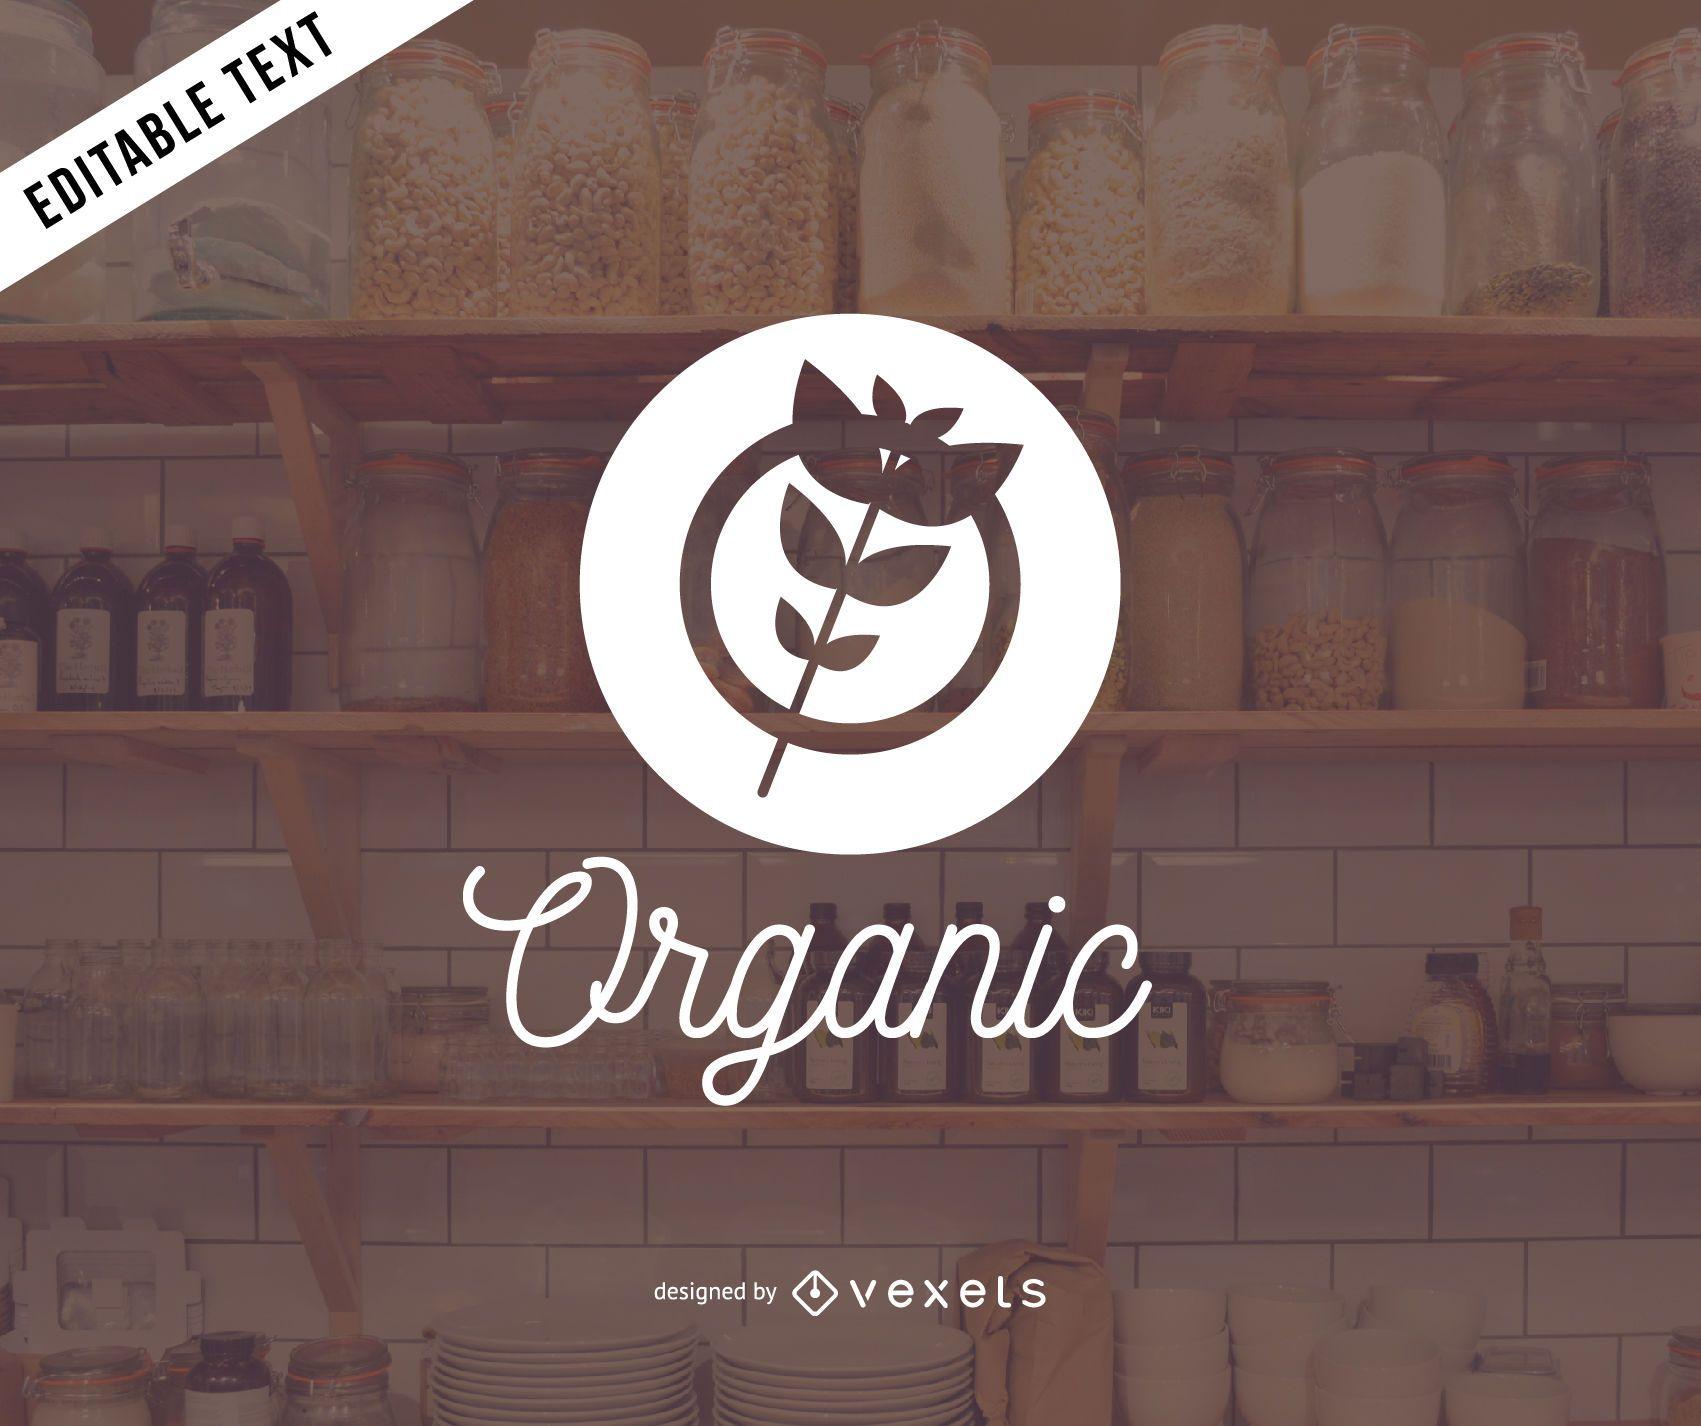 Diseño de logo de productos orgánicos